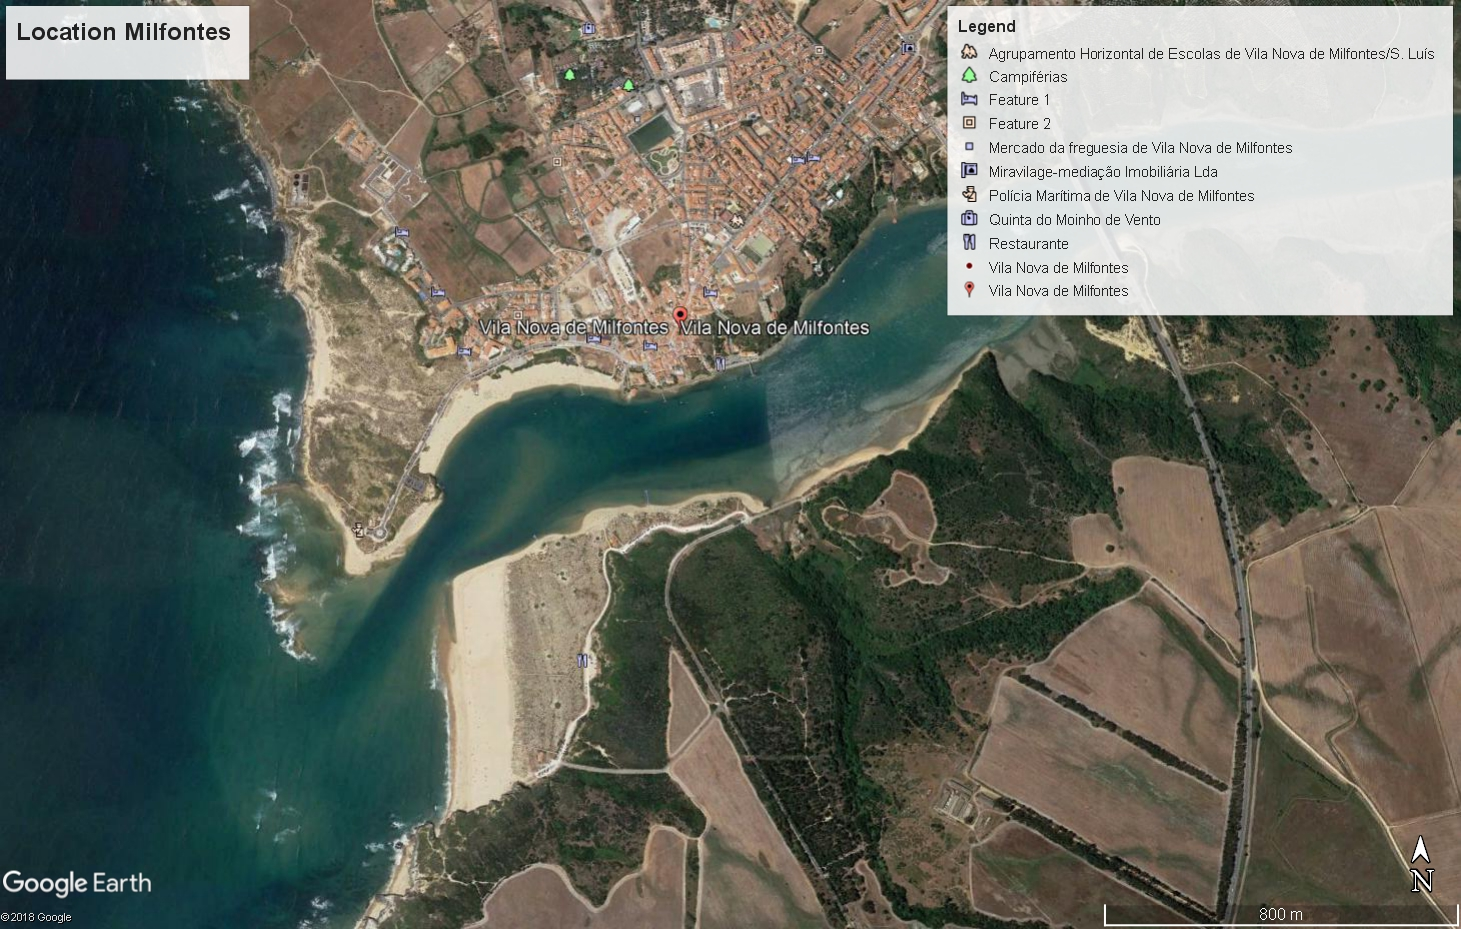 Milfontes - location